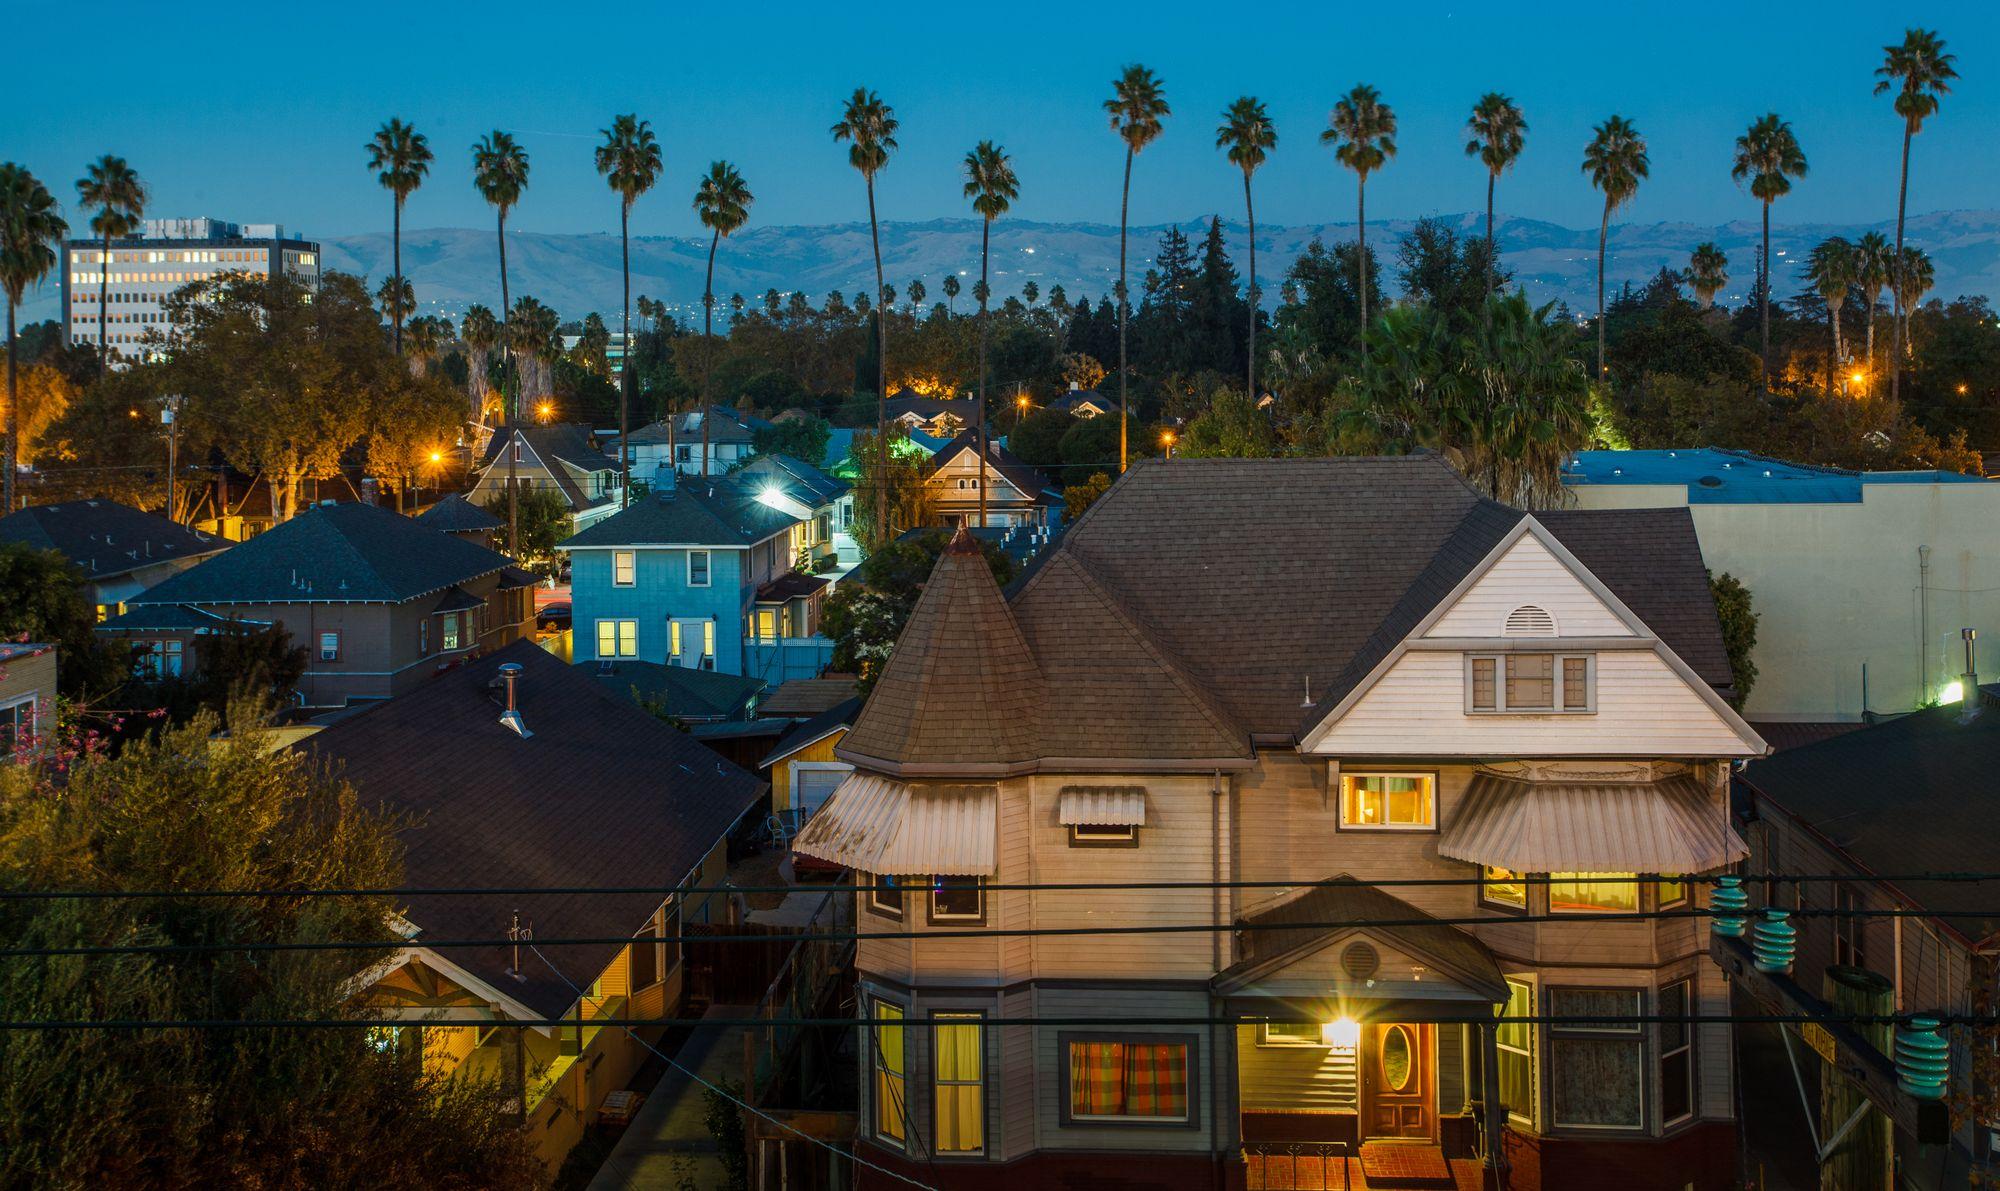 Take a field trip to Silicon Valley, California